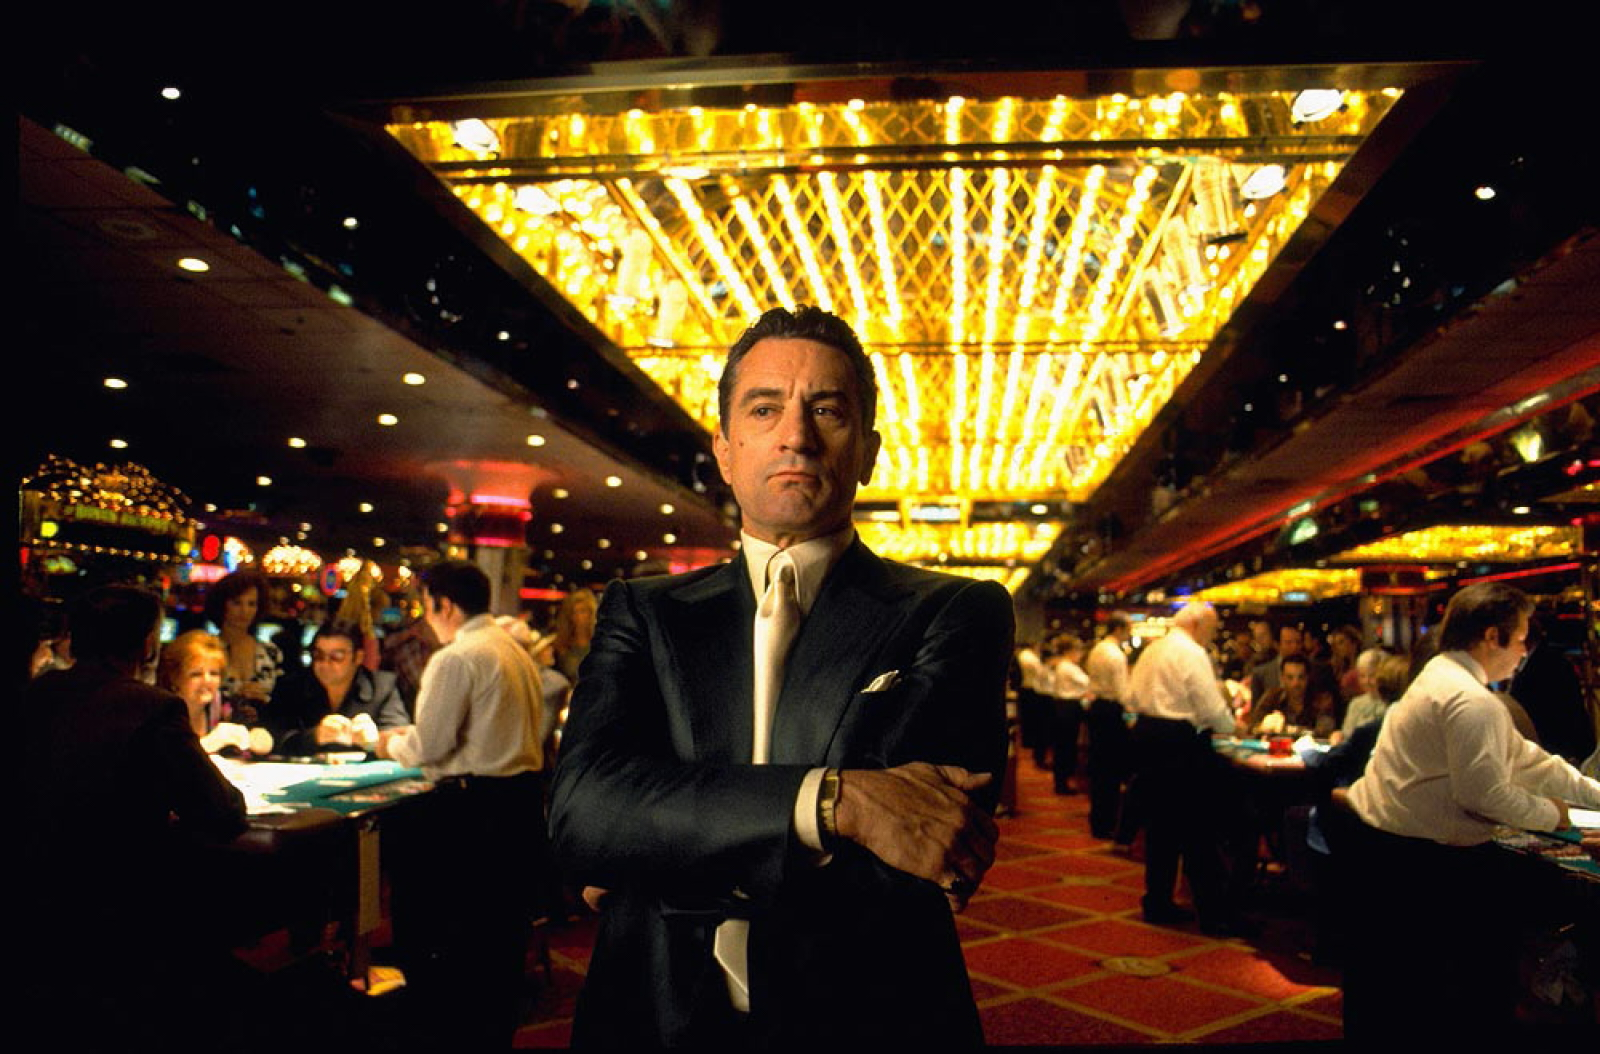 Casino martin scorsese online espaol casino downloads play for fun